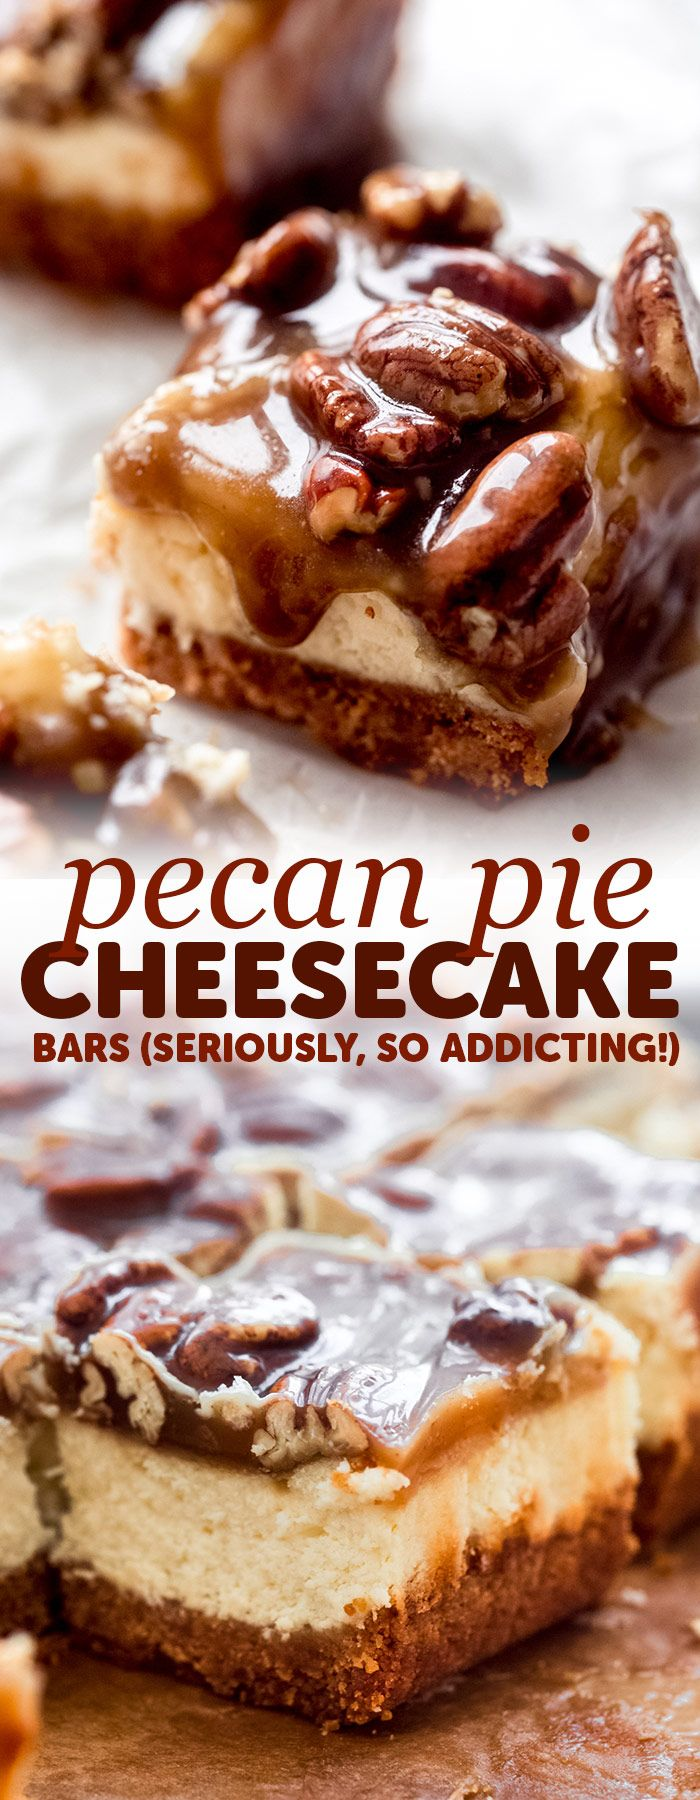 Pecan Pie Cheesecake Bars Recipe | Little Spice Jar